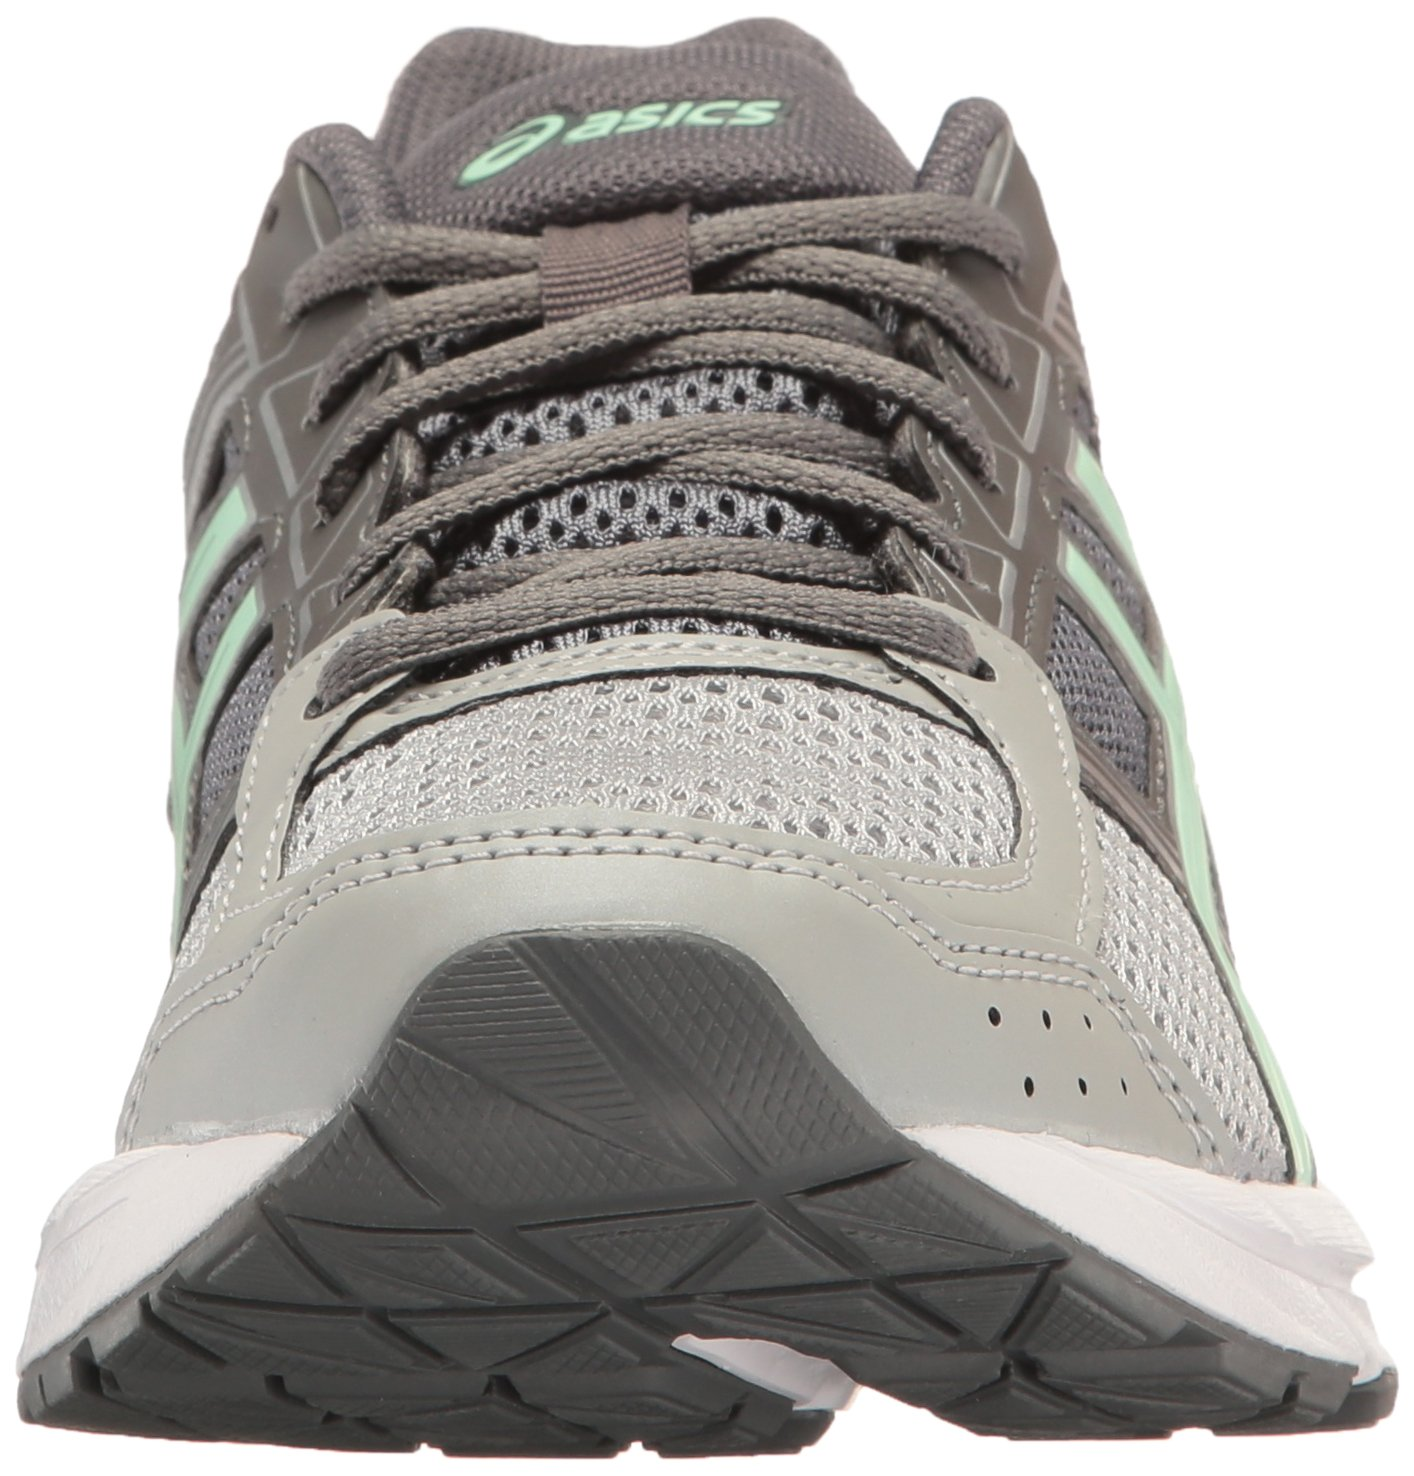 ASICS Womens Gel-Contend 4 Running Shoe, Mid Grey/Glacier Sea/Silver, 5 Medium US by ASICS (Image #4)